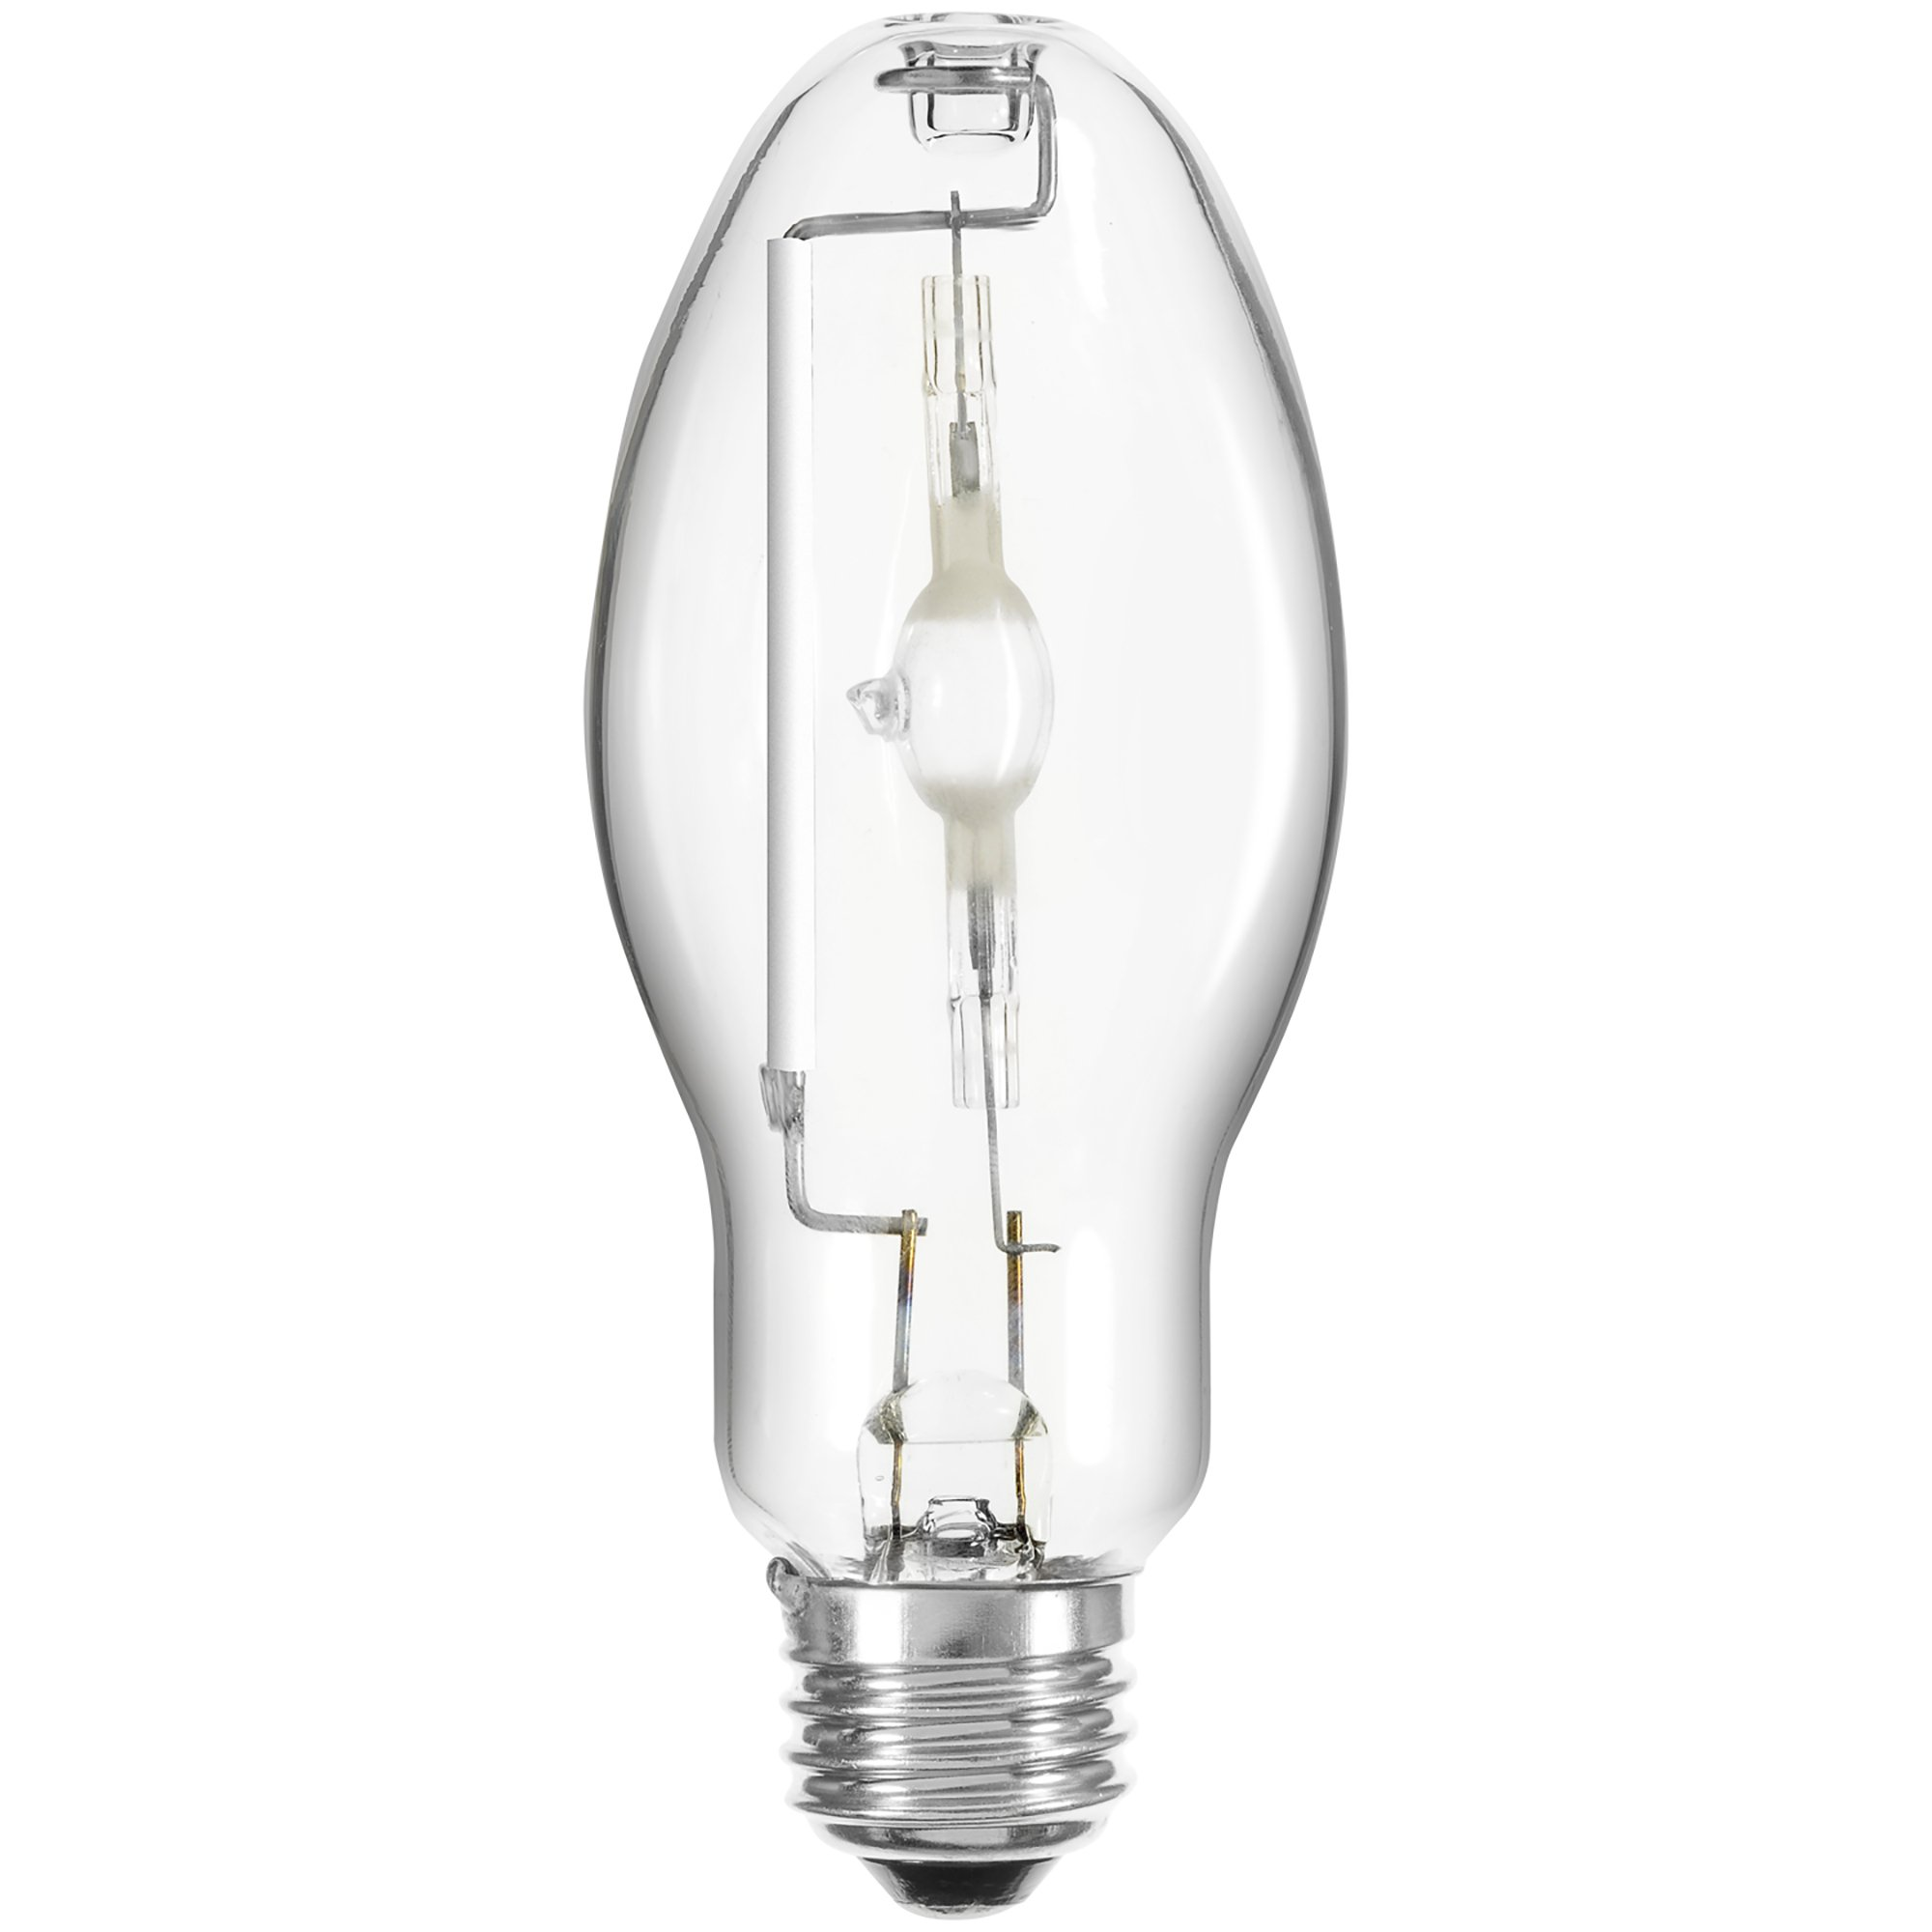 Brinks 7068 Light Bulb 100W Halide Light